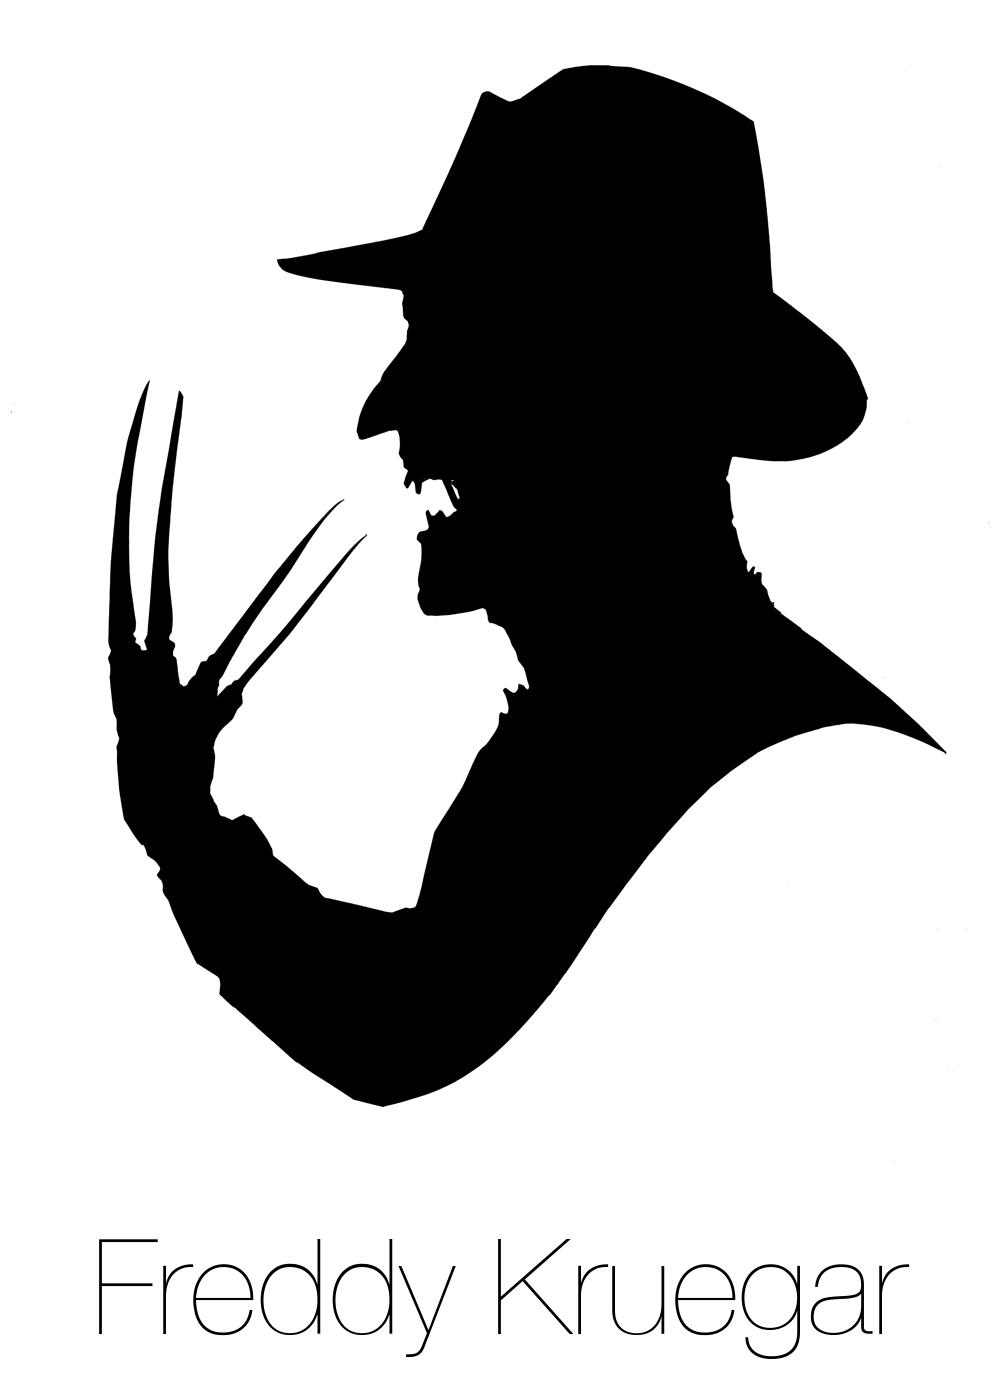 Freddy krueger silhouette happy horror days pinterest for Pumpkin carving silhouettes